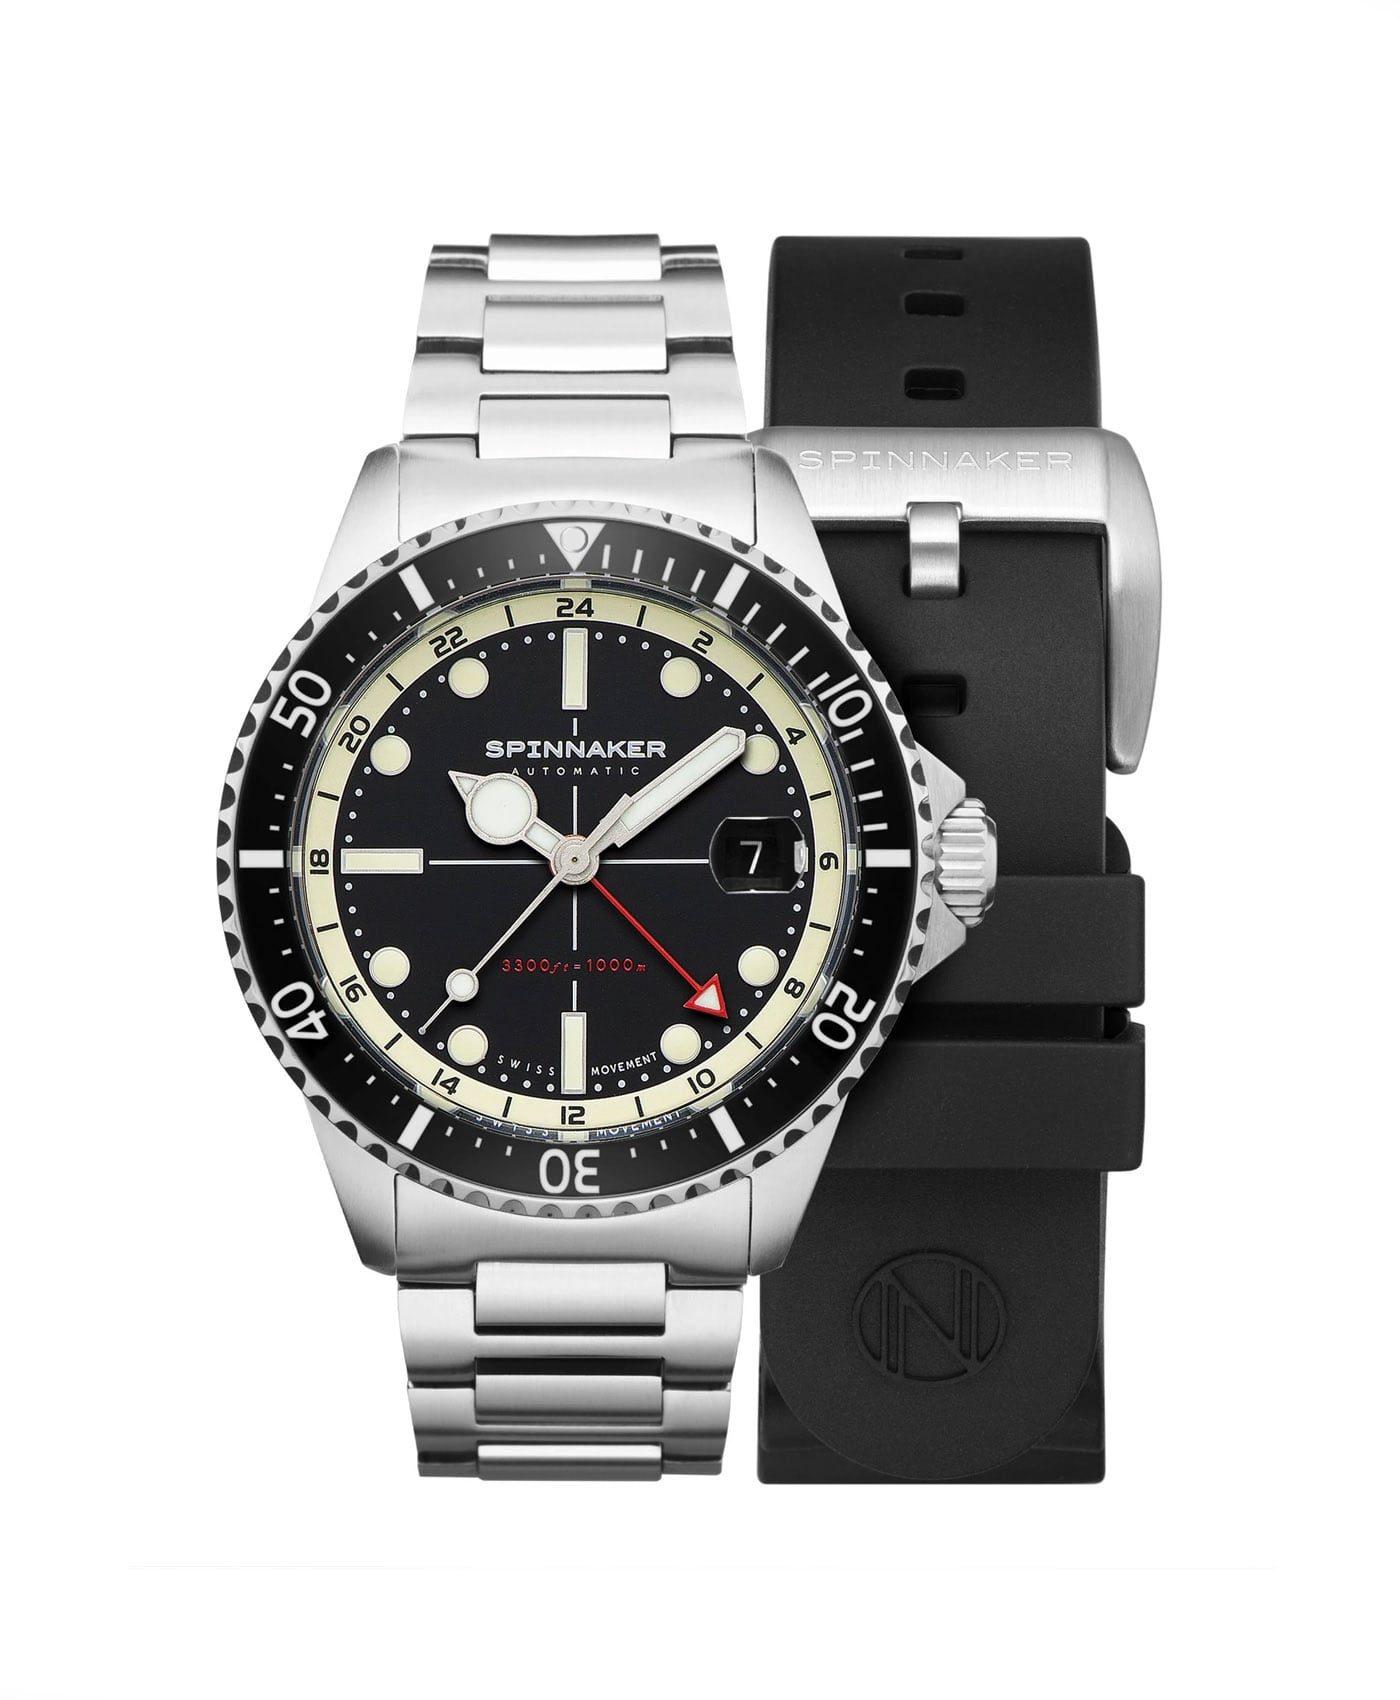 Spinnaker Tesei Mille Metri GMT - Midnight Black SP-5091-11